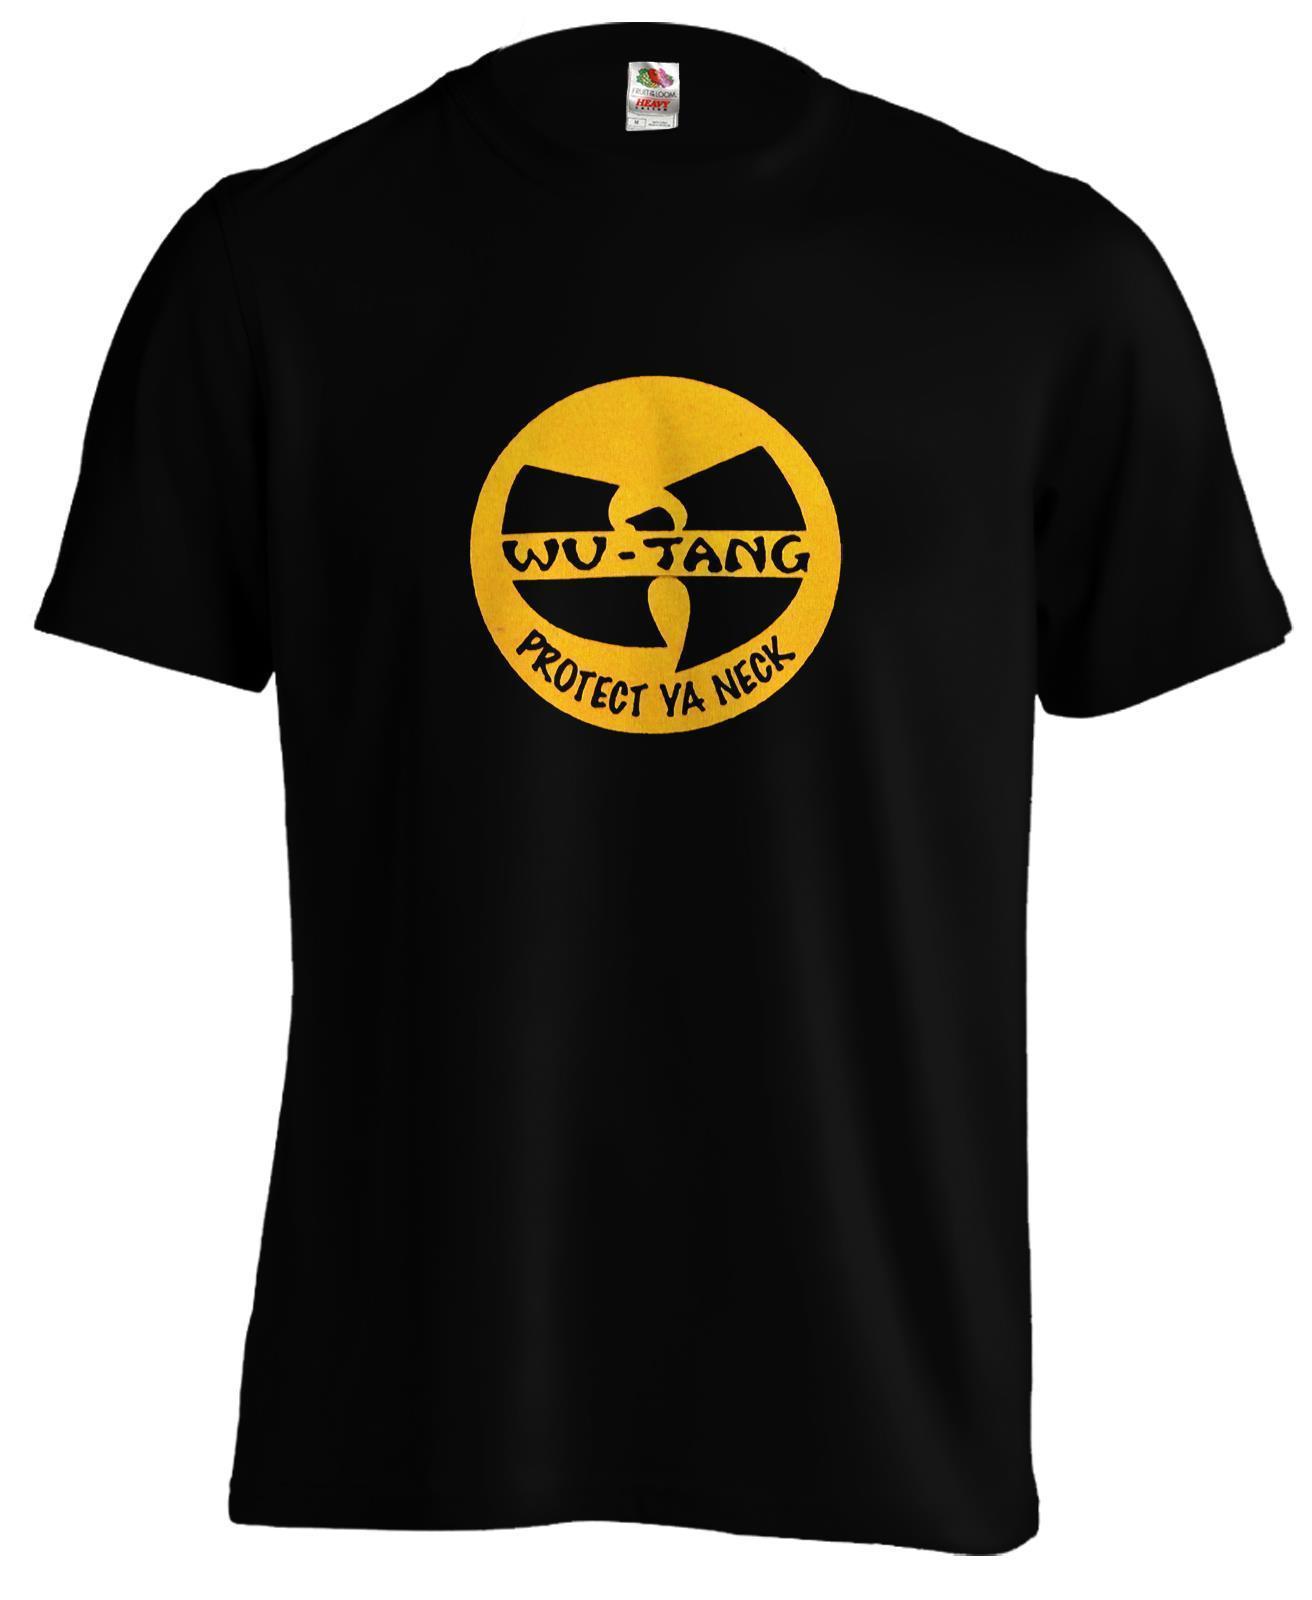 6ffdf563 Wu Tang Clan Emblem Protect Ya Neck RZA GZA Rap Hip Hop Urban T ...